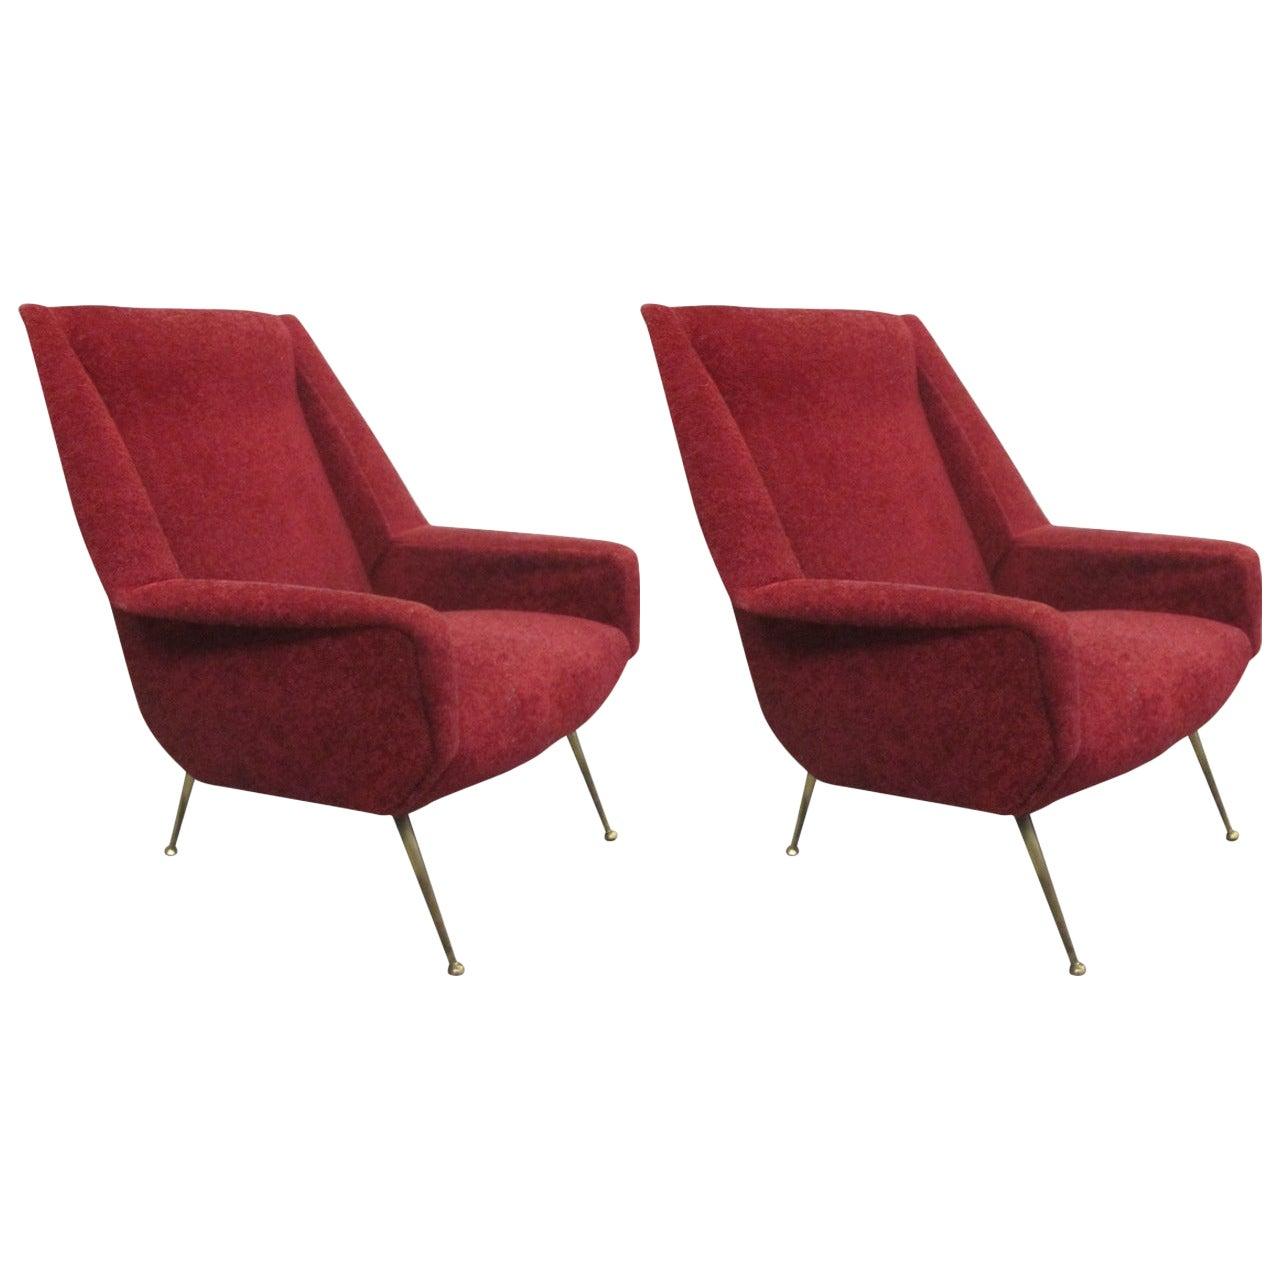 Italian Mid-Century Modern Lounge Chairs Attributed to Gianfranco Frattini, Pair